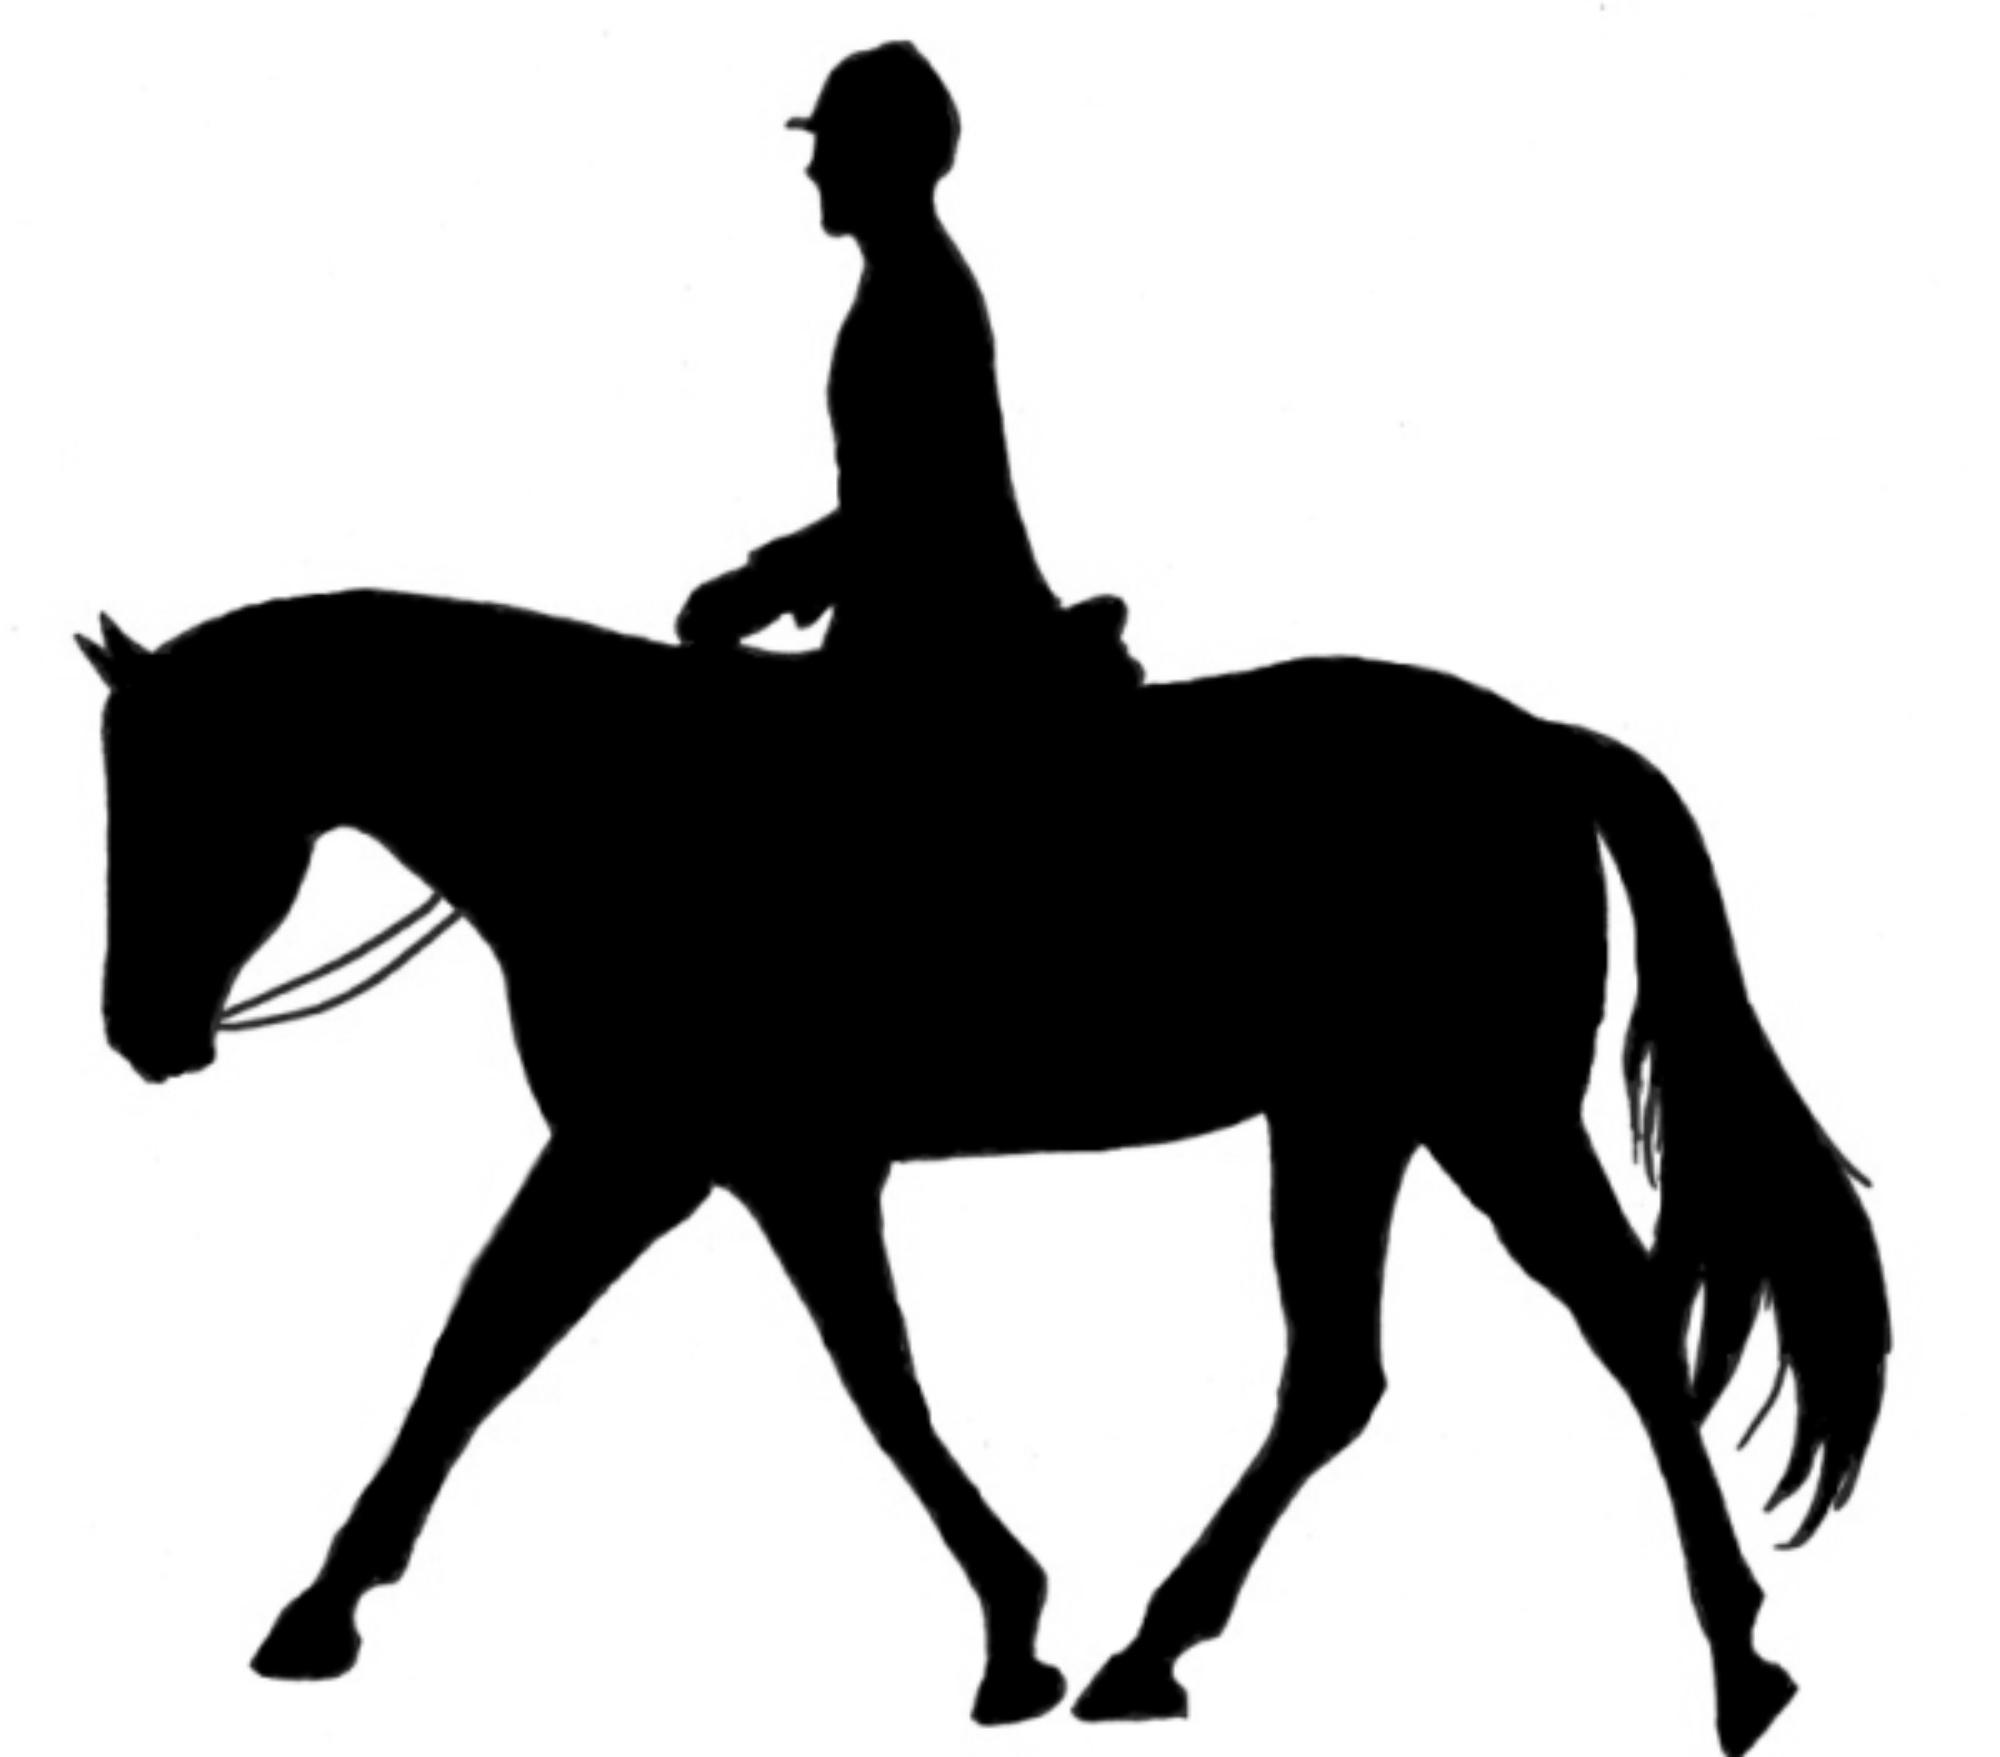 Horseback cliparts-Horseback cliparts-17